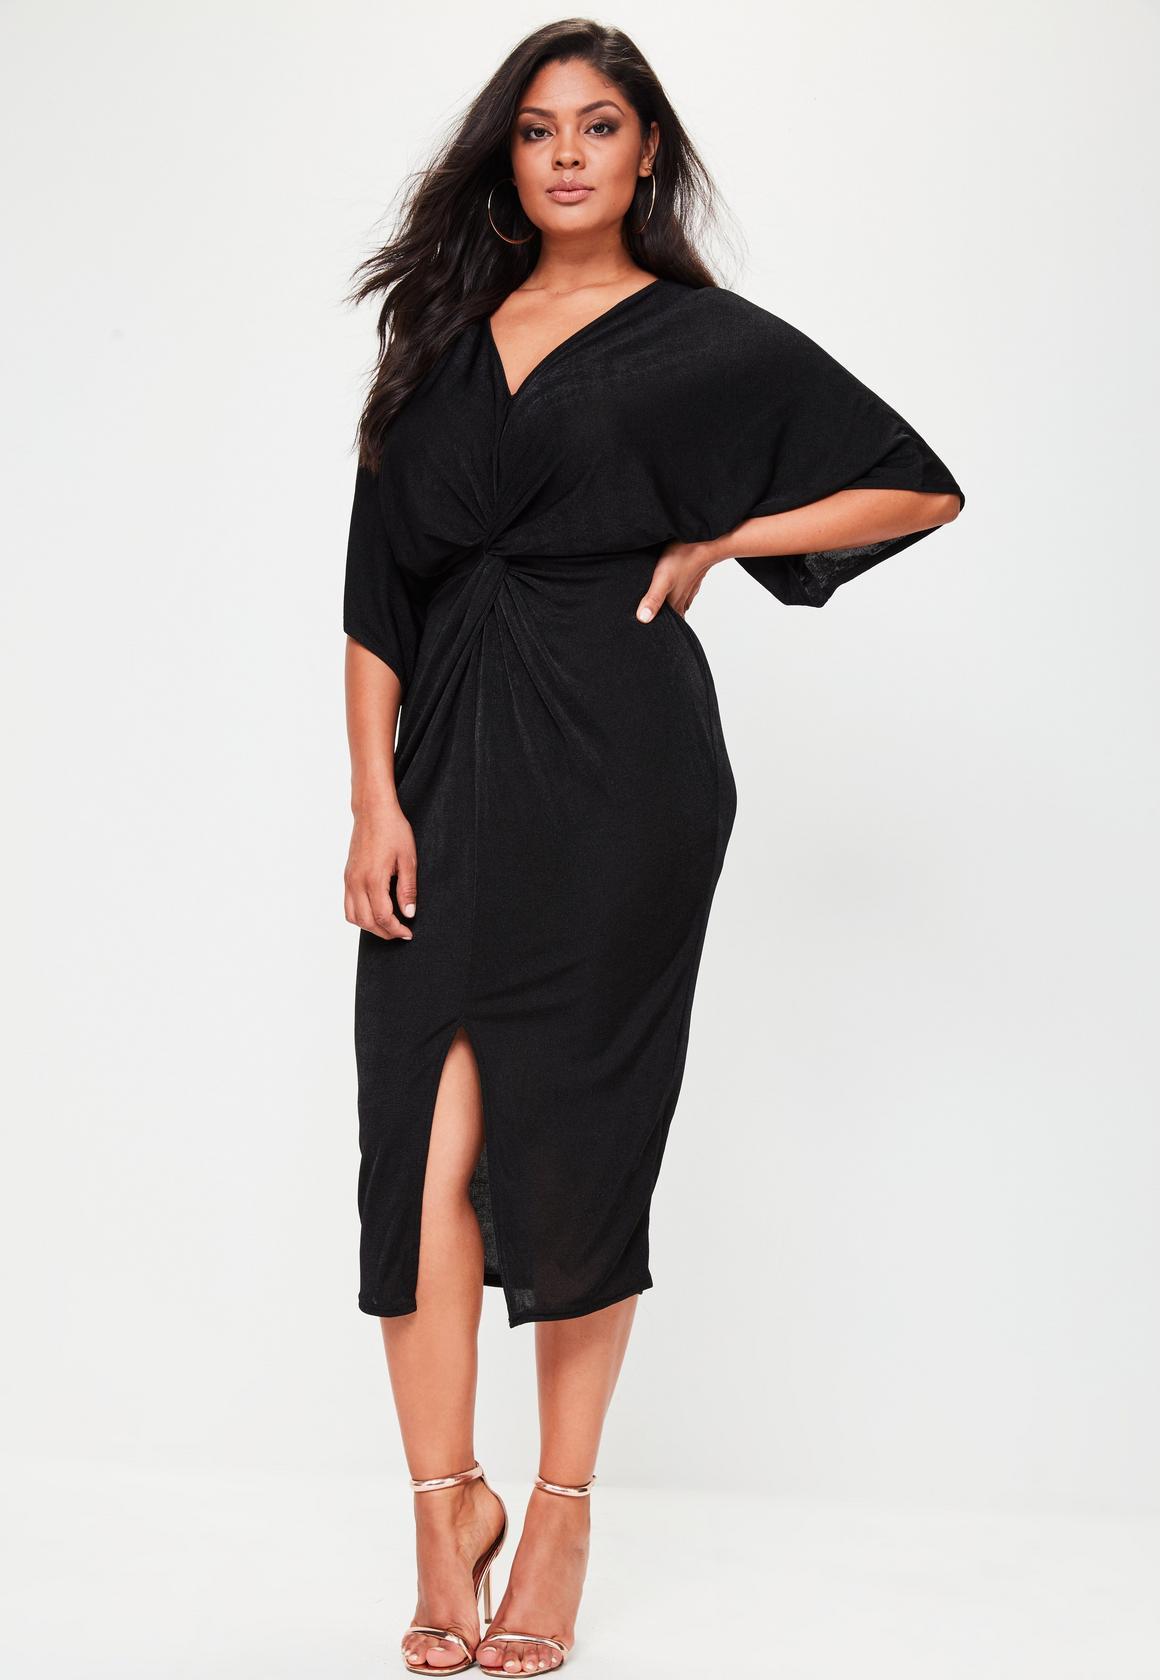 dc11ace079b 50 Trendy Plus Size New Years Eve Dresses 2020 - Plus Size Women Fashion